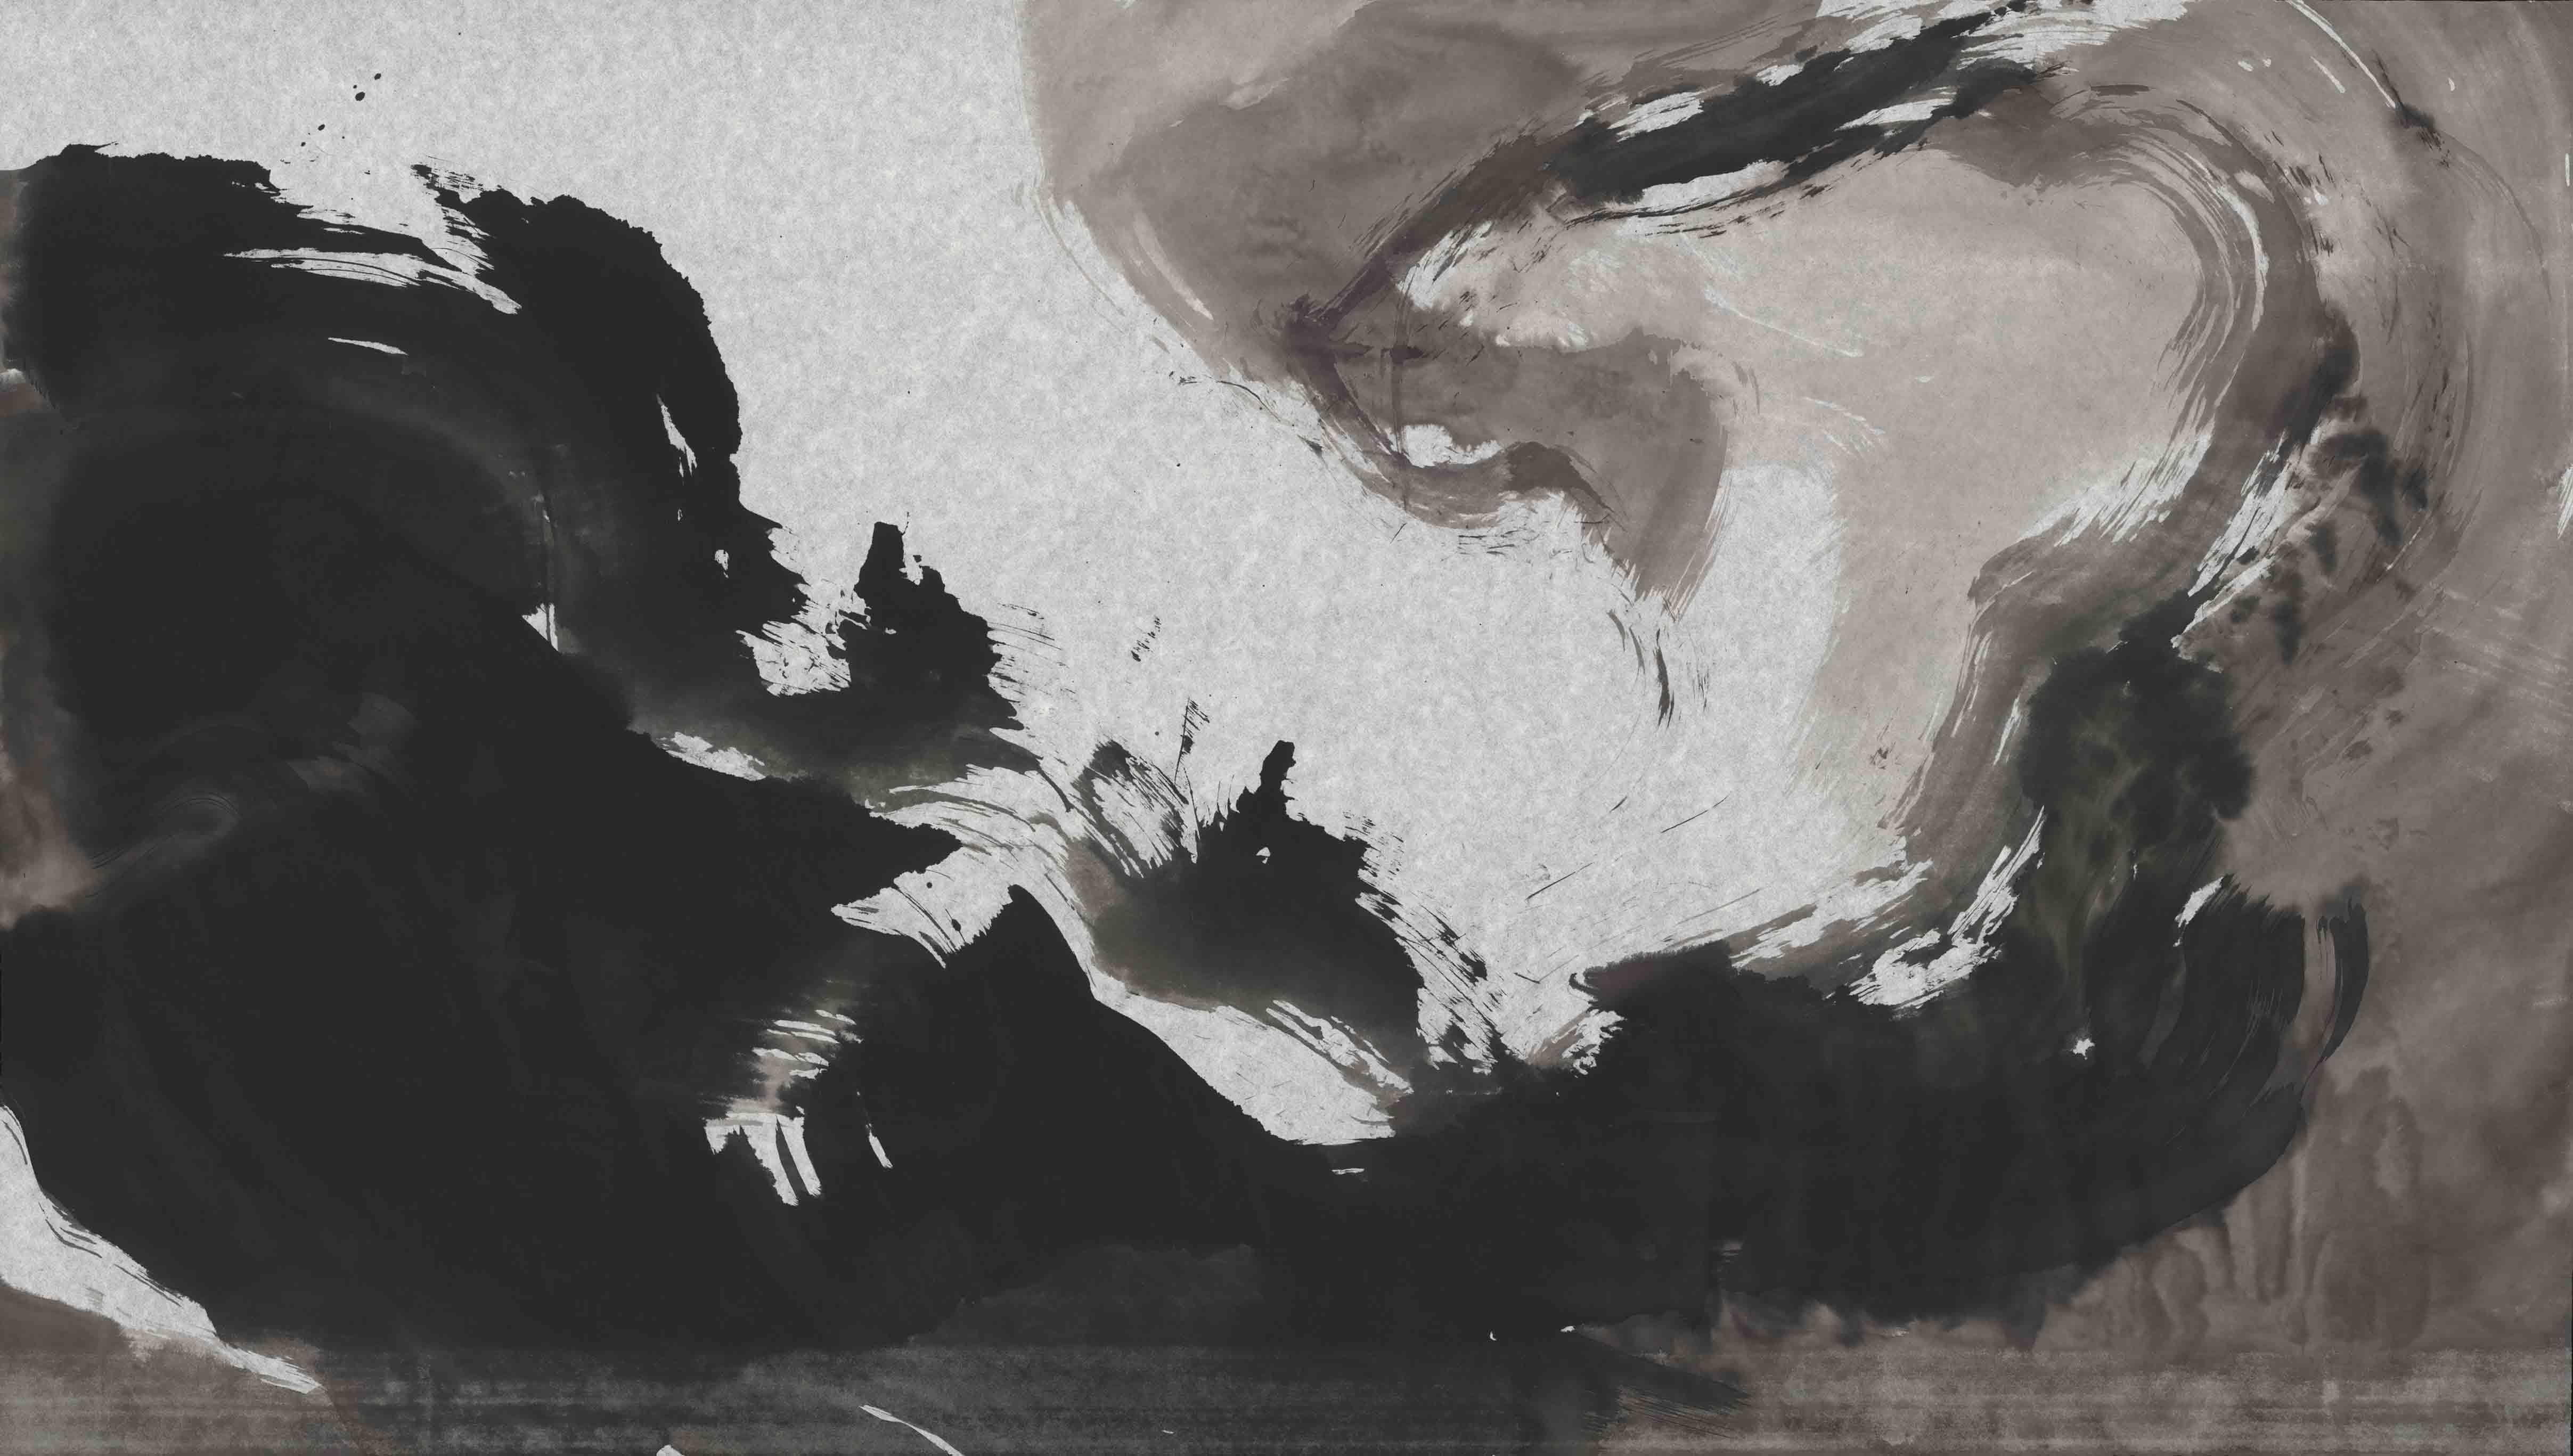 Life of a river, 60x80 cm, ink, paper, 2016